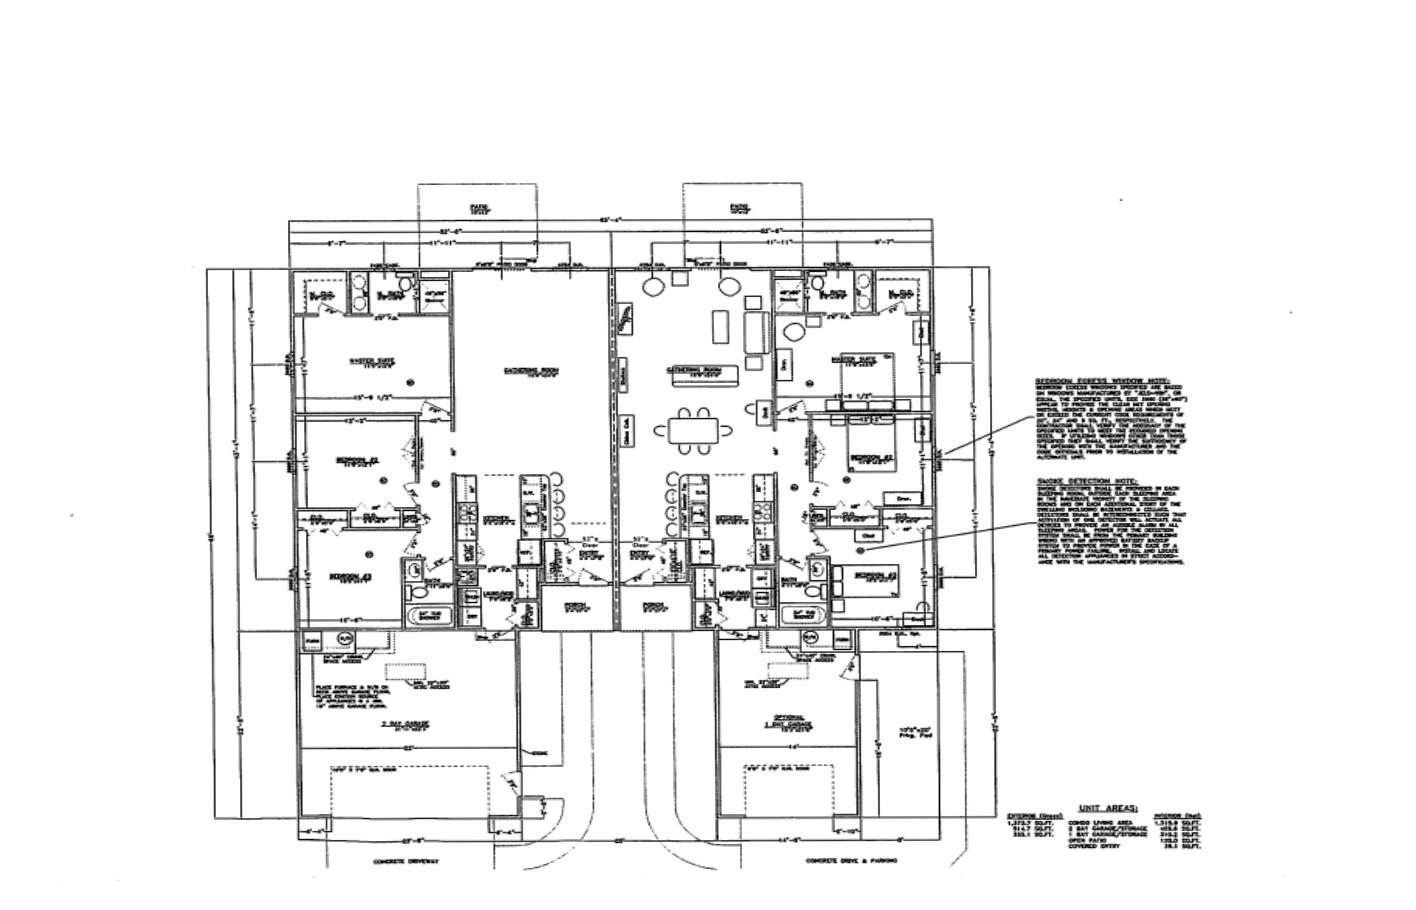 Floor Plan for Units plan B